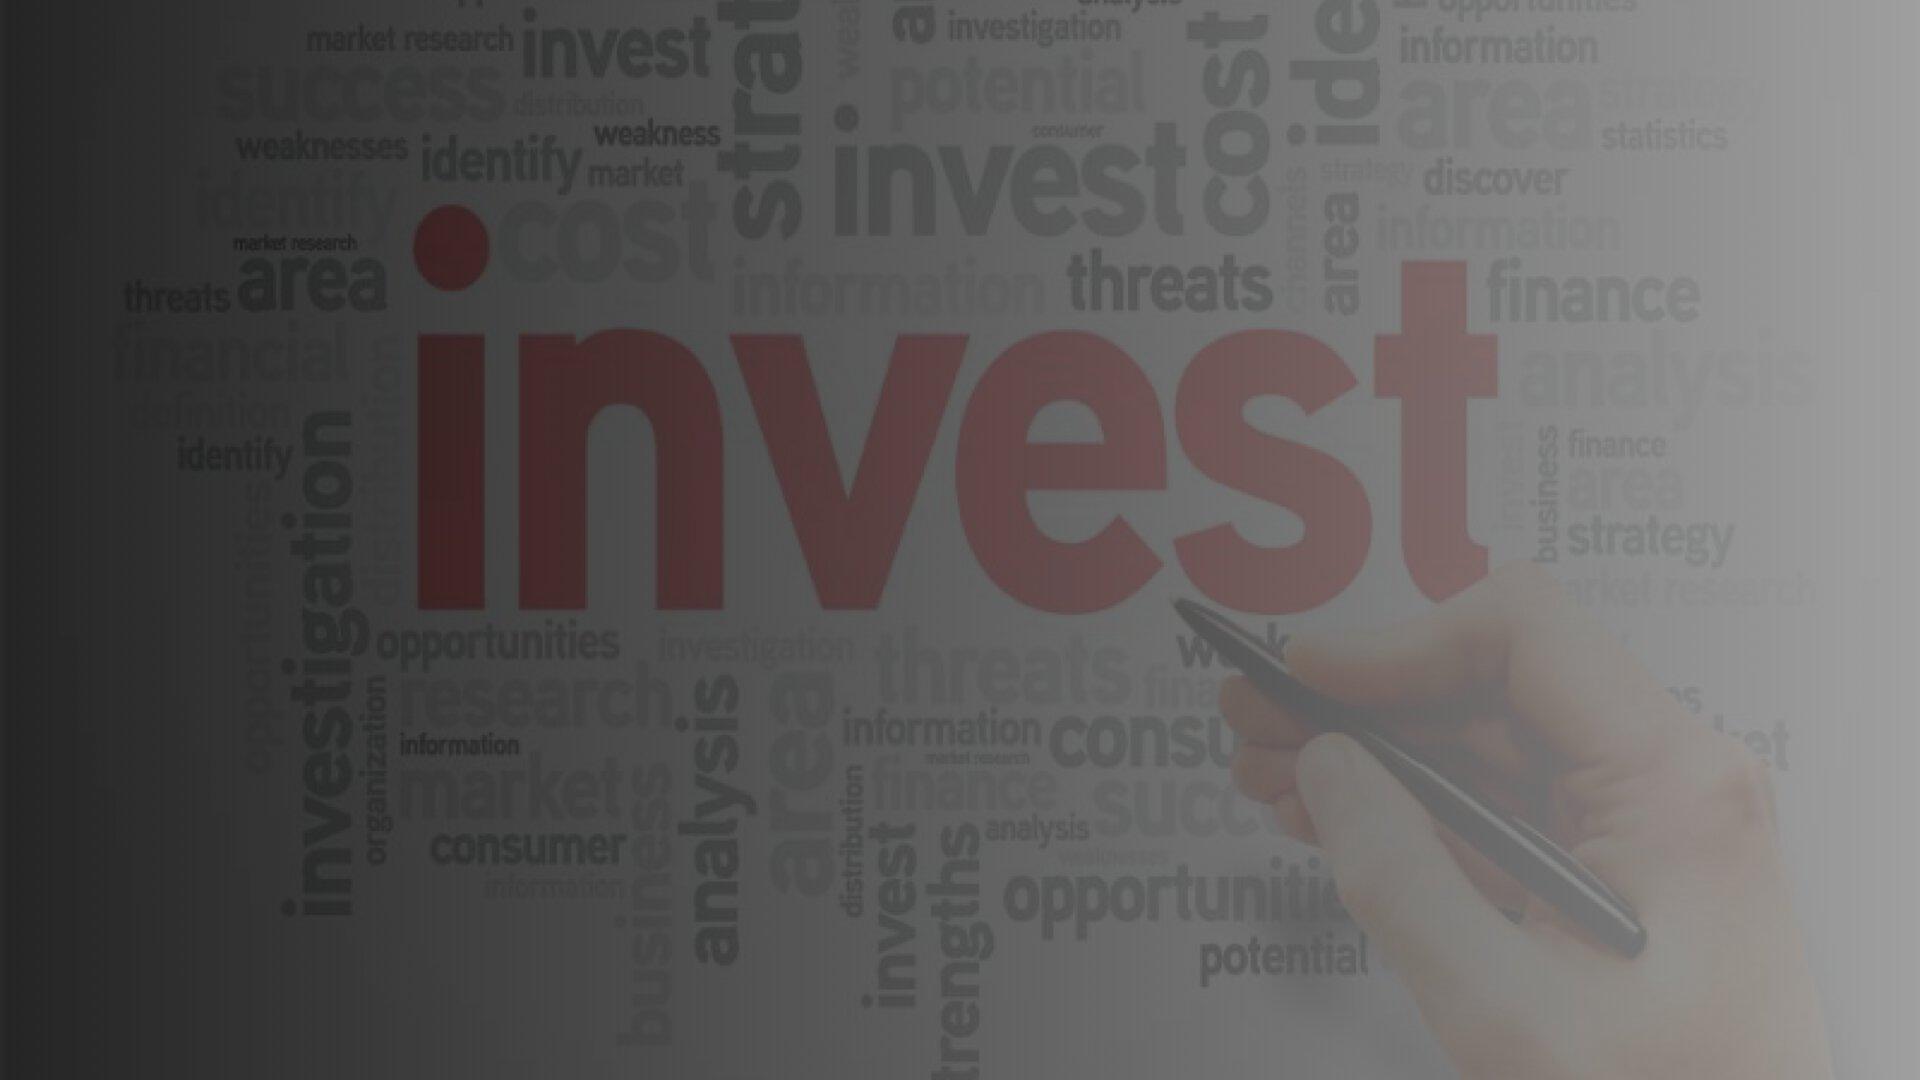 Comvest investment partners iv cranford leemar investments inc hesperia ca weather